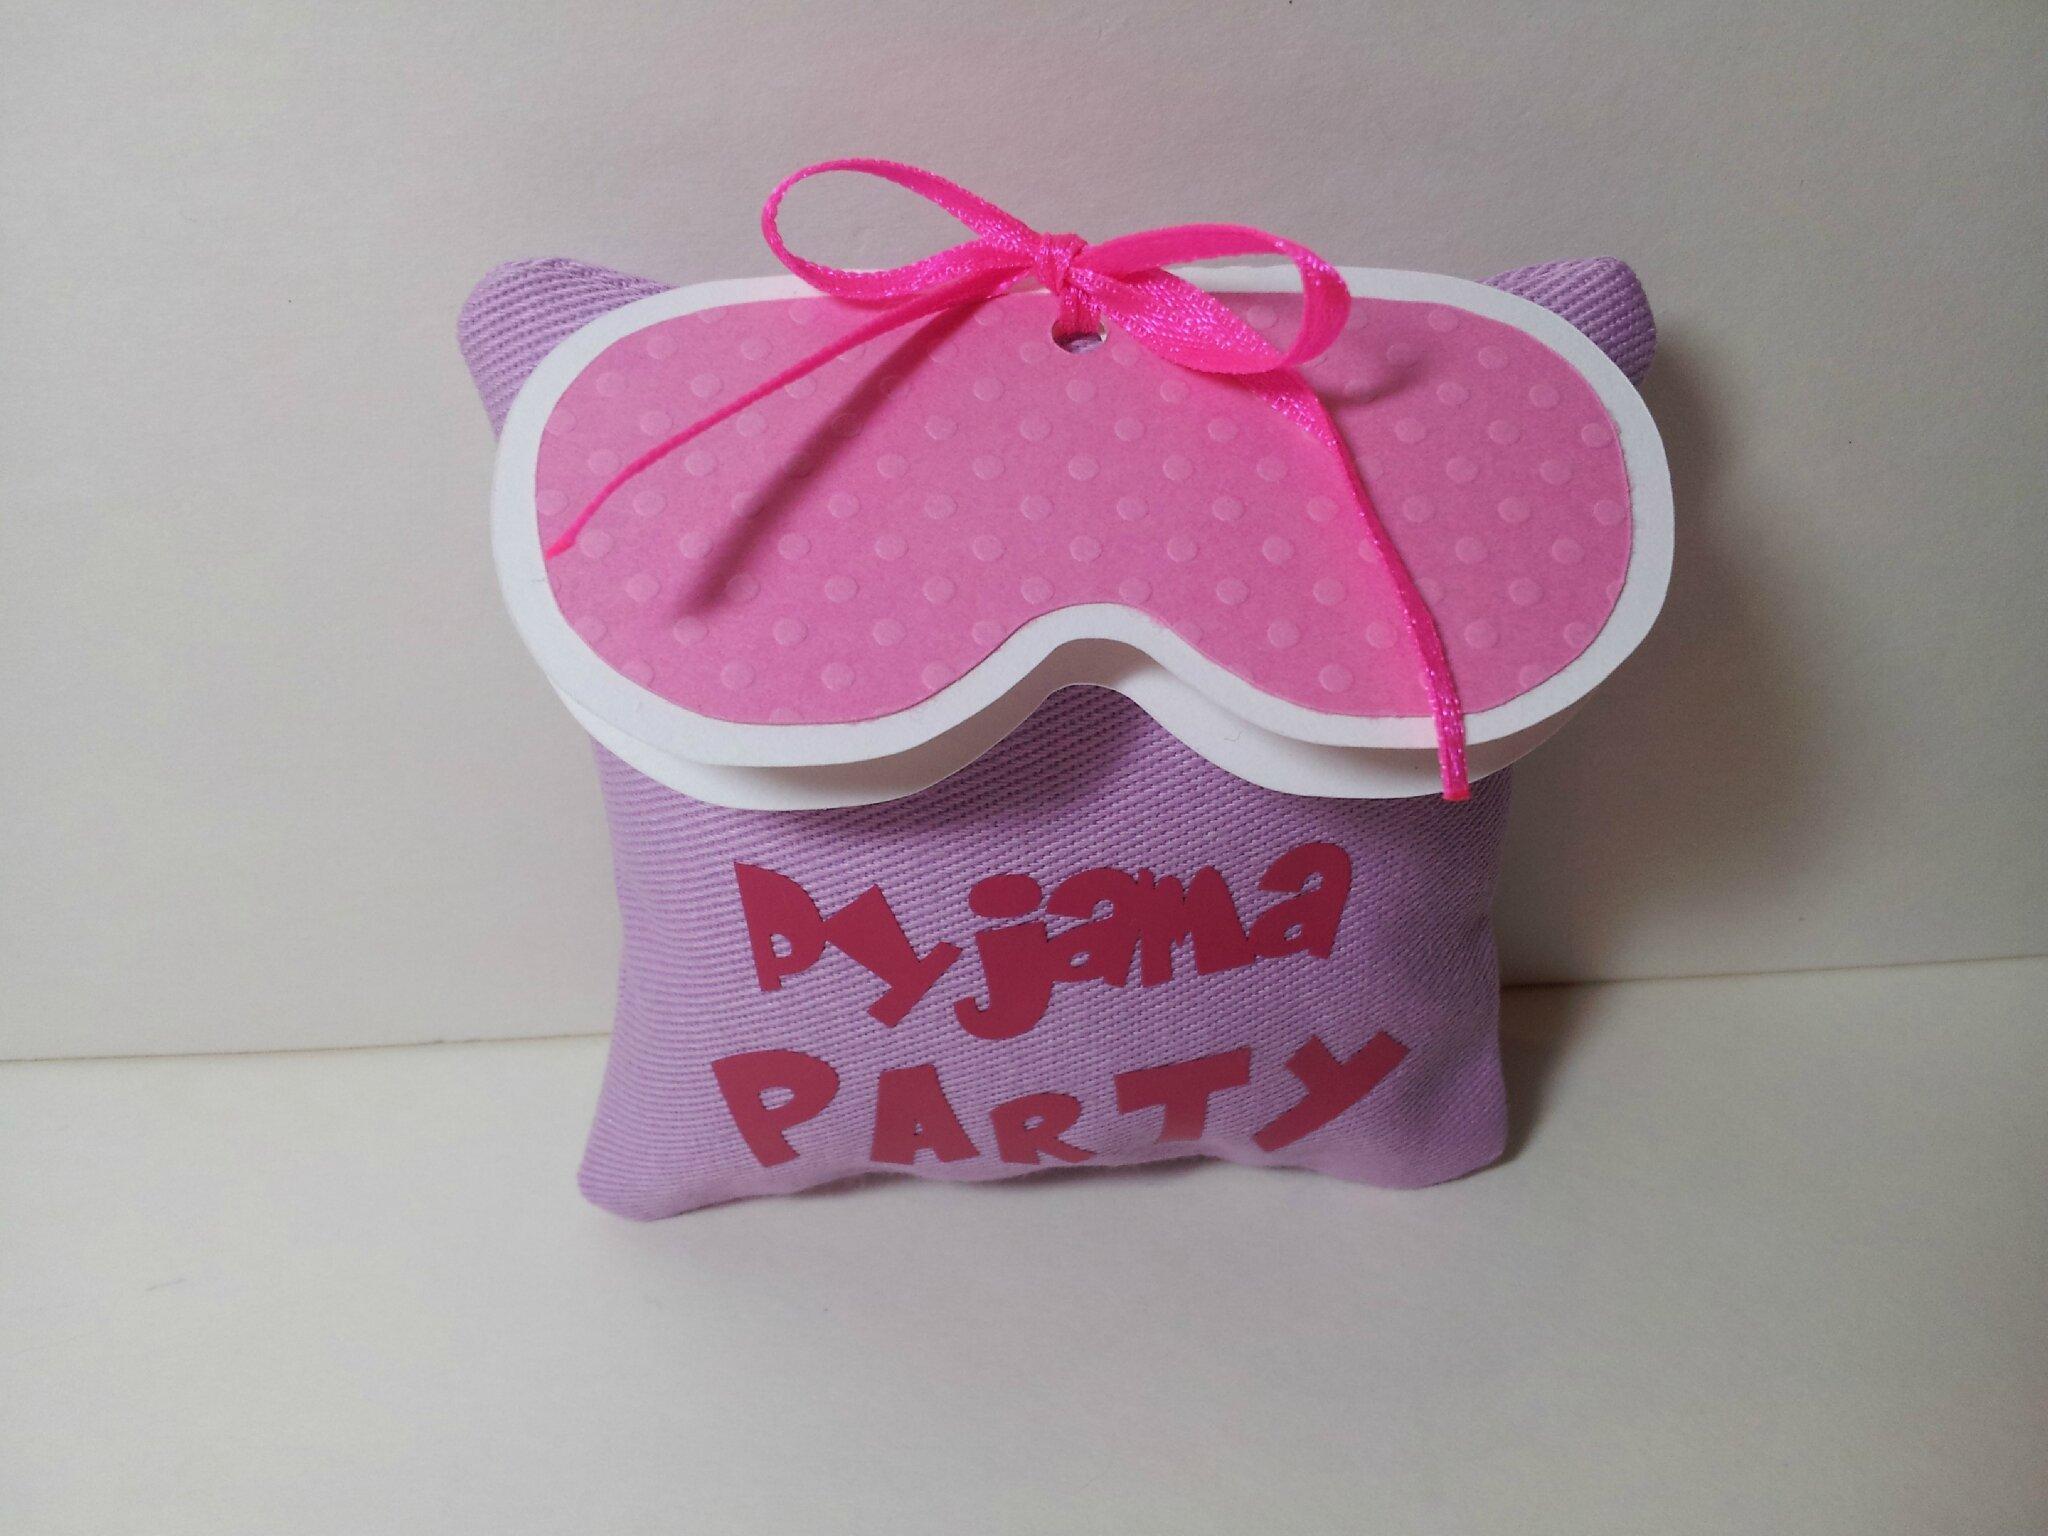 pyjama party marie l cree